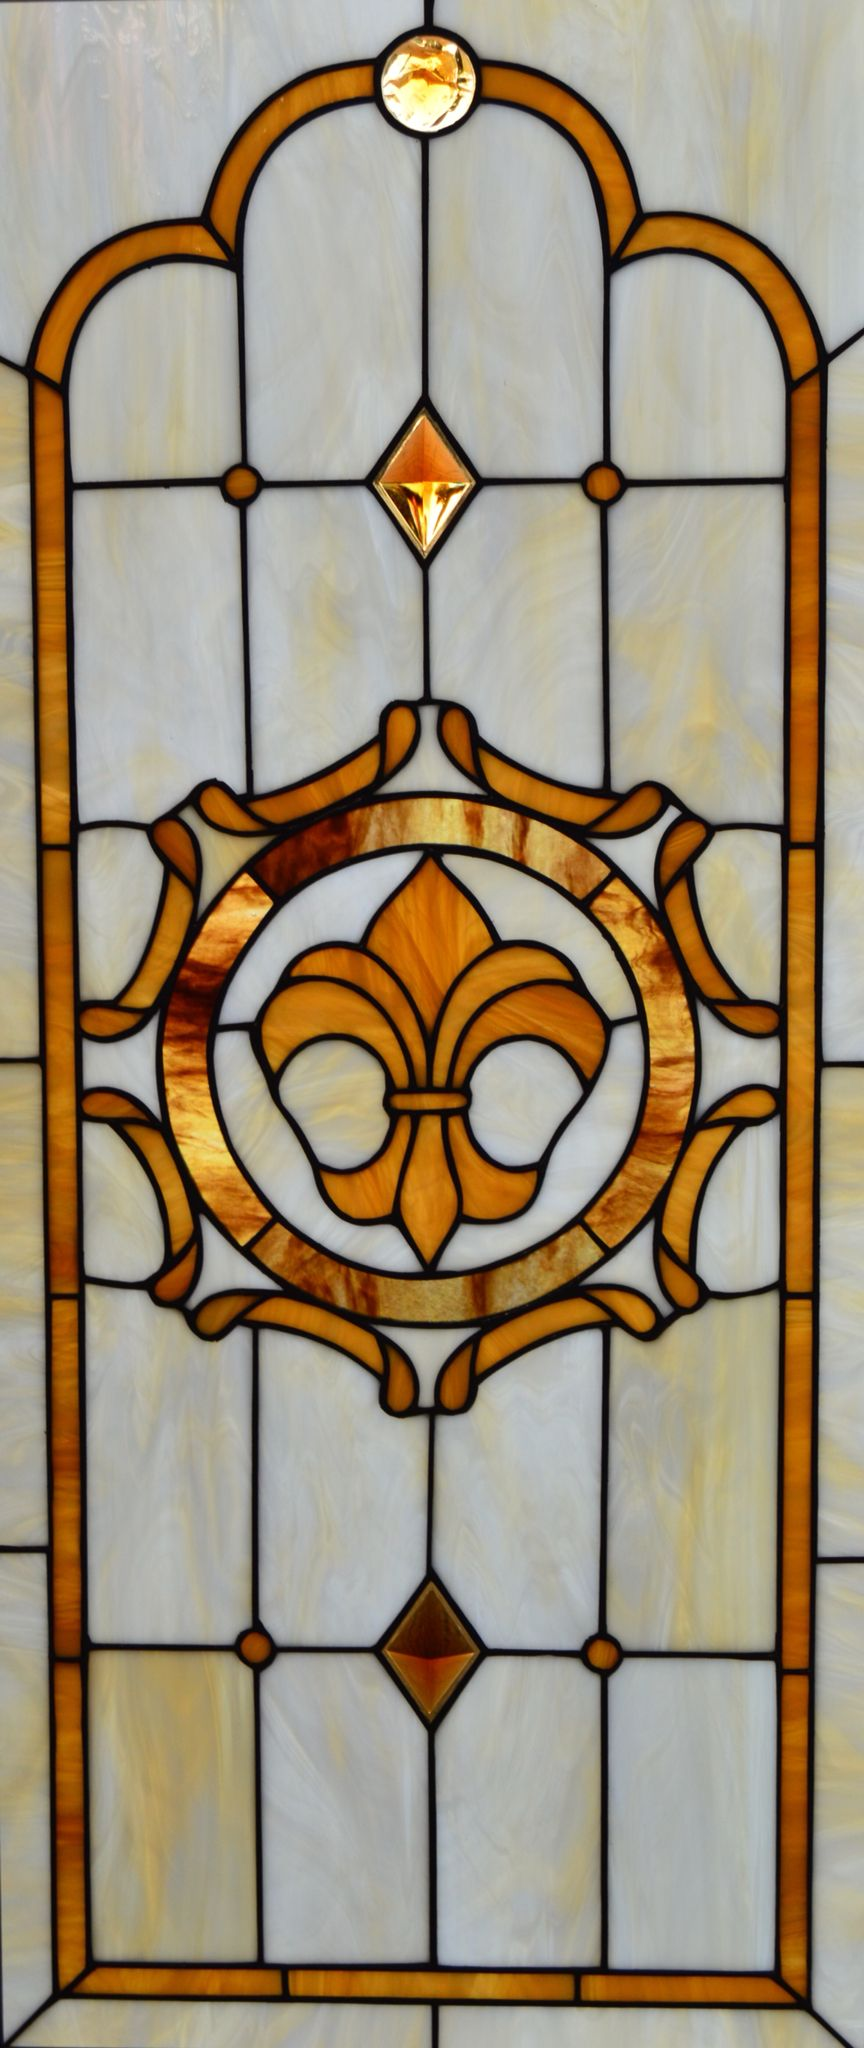 Custom Stained Glass With Fleur-de-lis Design